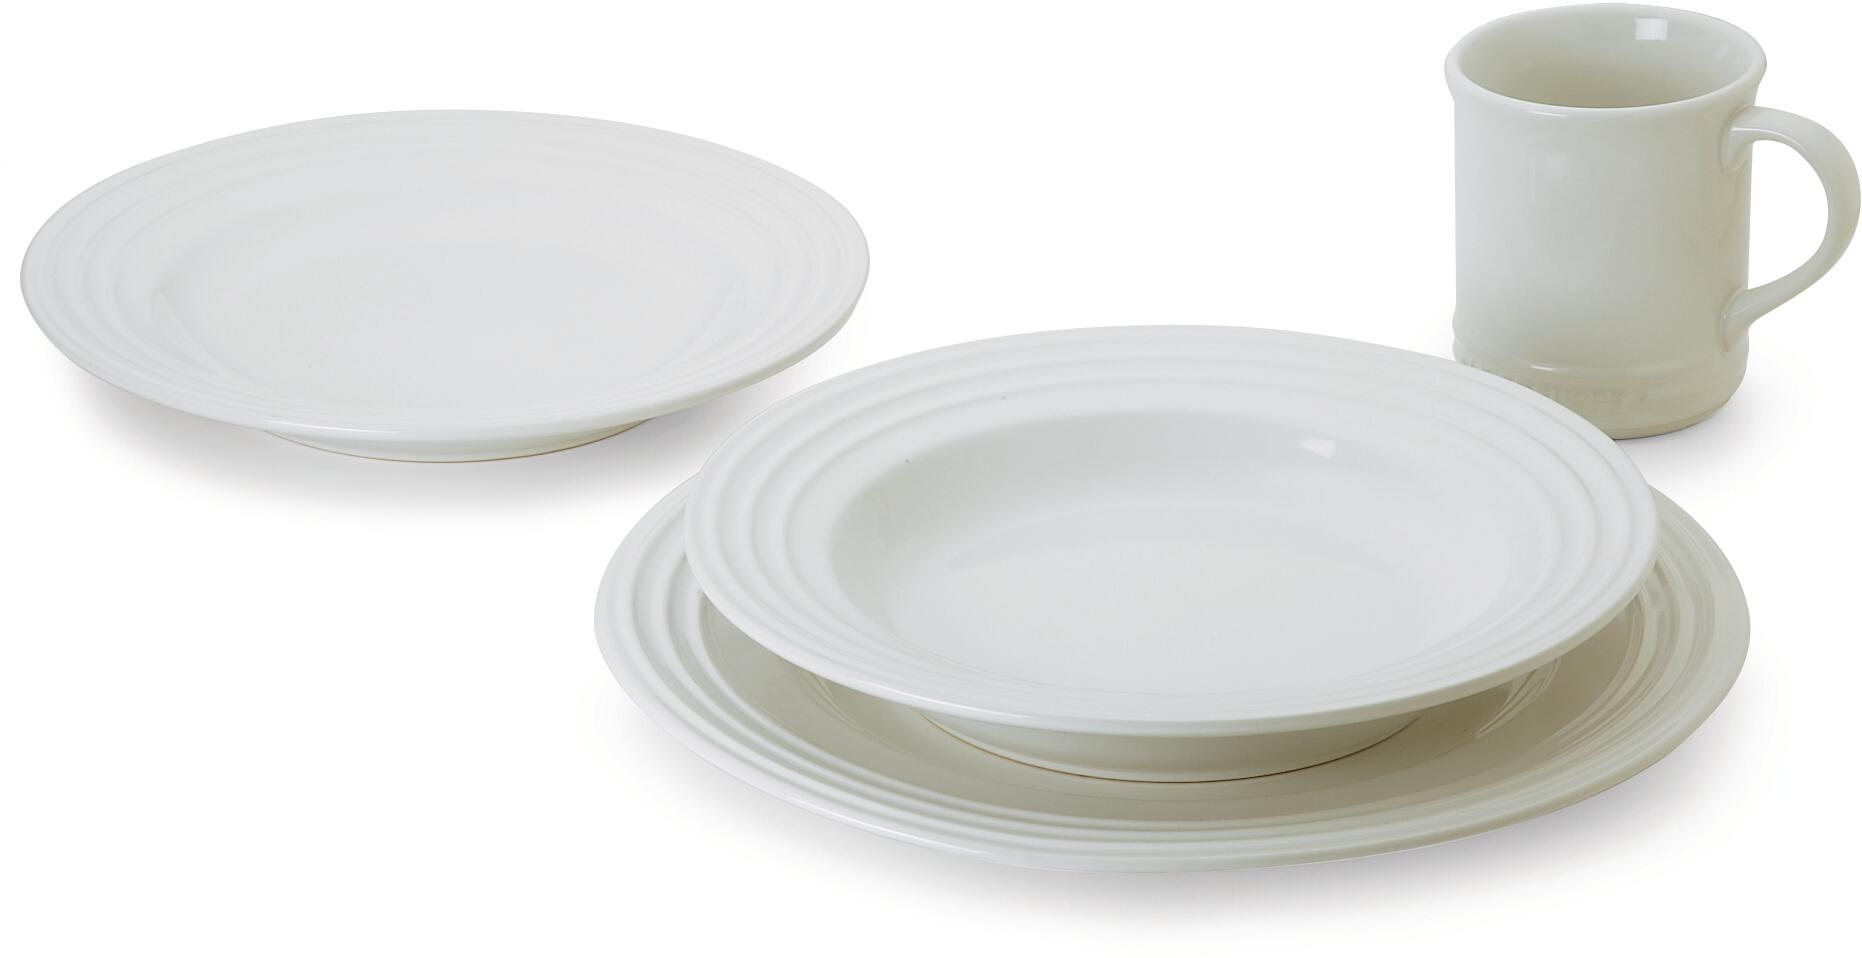 Le Creuset 16 Piece White Stoneware Dinnerware Set, Service for 4